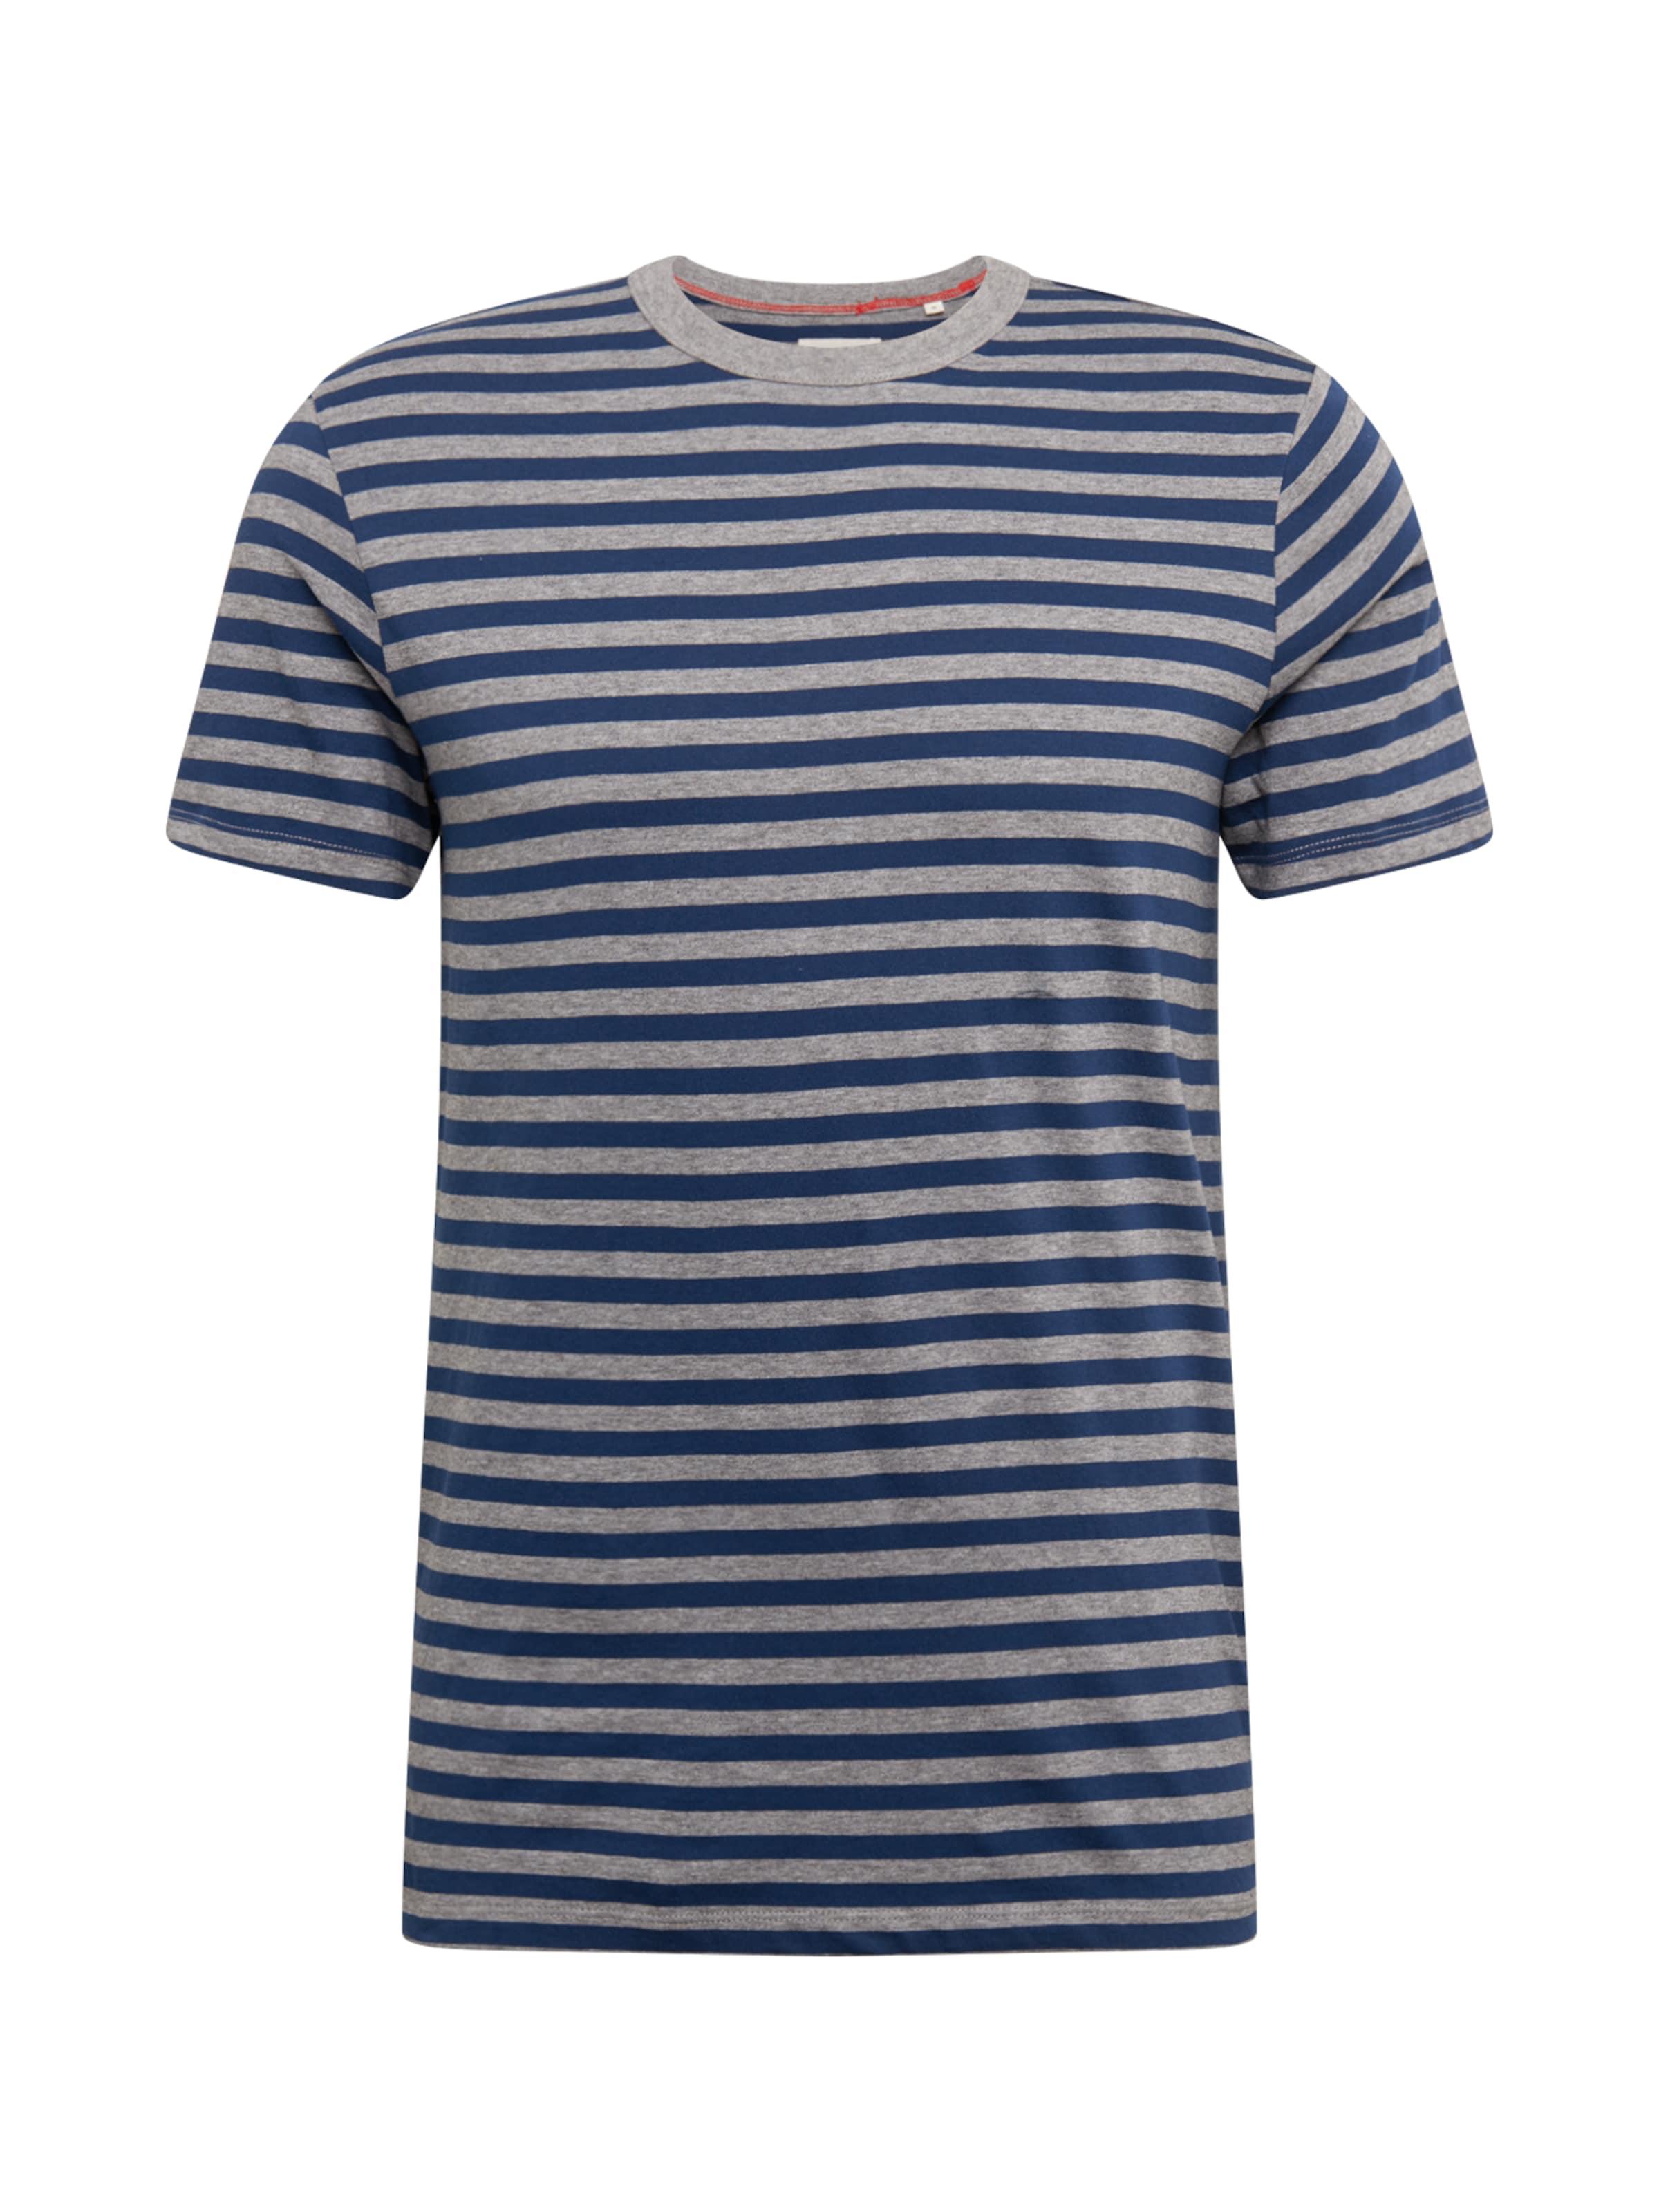 T O'polo shirt Marc En BleuGris 4j5Rc3LAqS